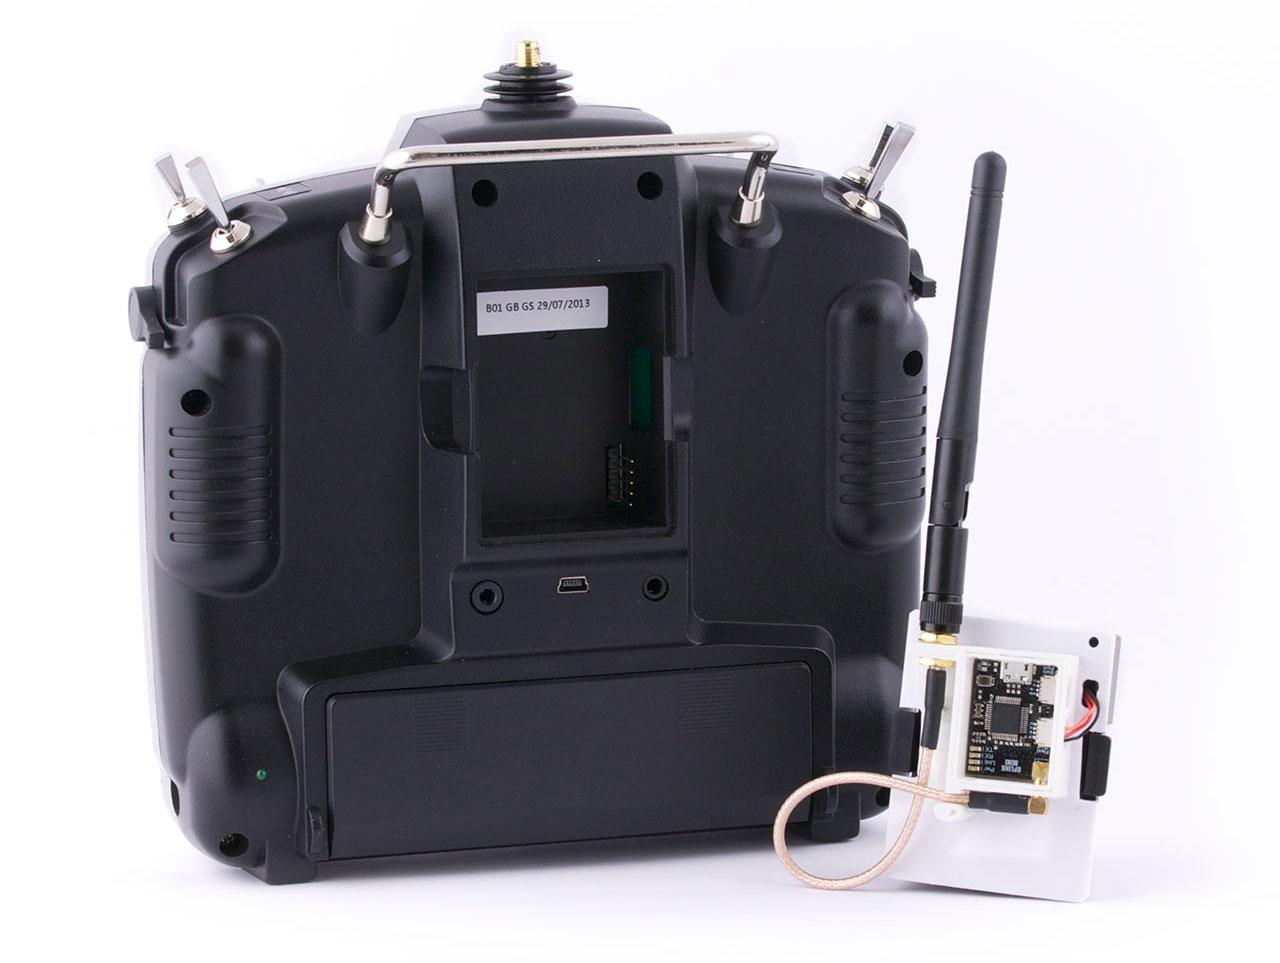 Oplm Vehicle Control Link Librepilot Openpilot Wiki 014 Frsky Cc3d Wiring Diagram Mounting The Oplink Module To Transmitter